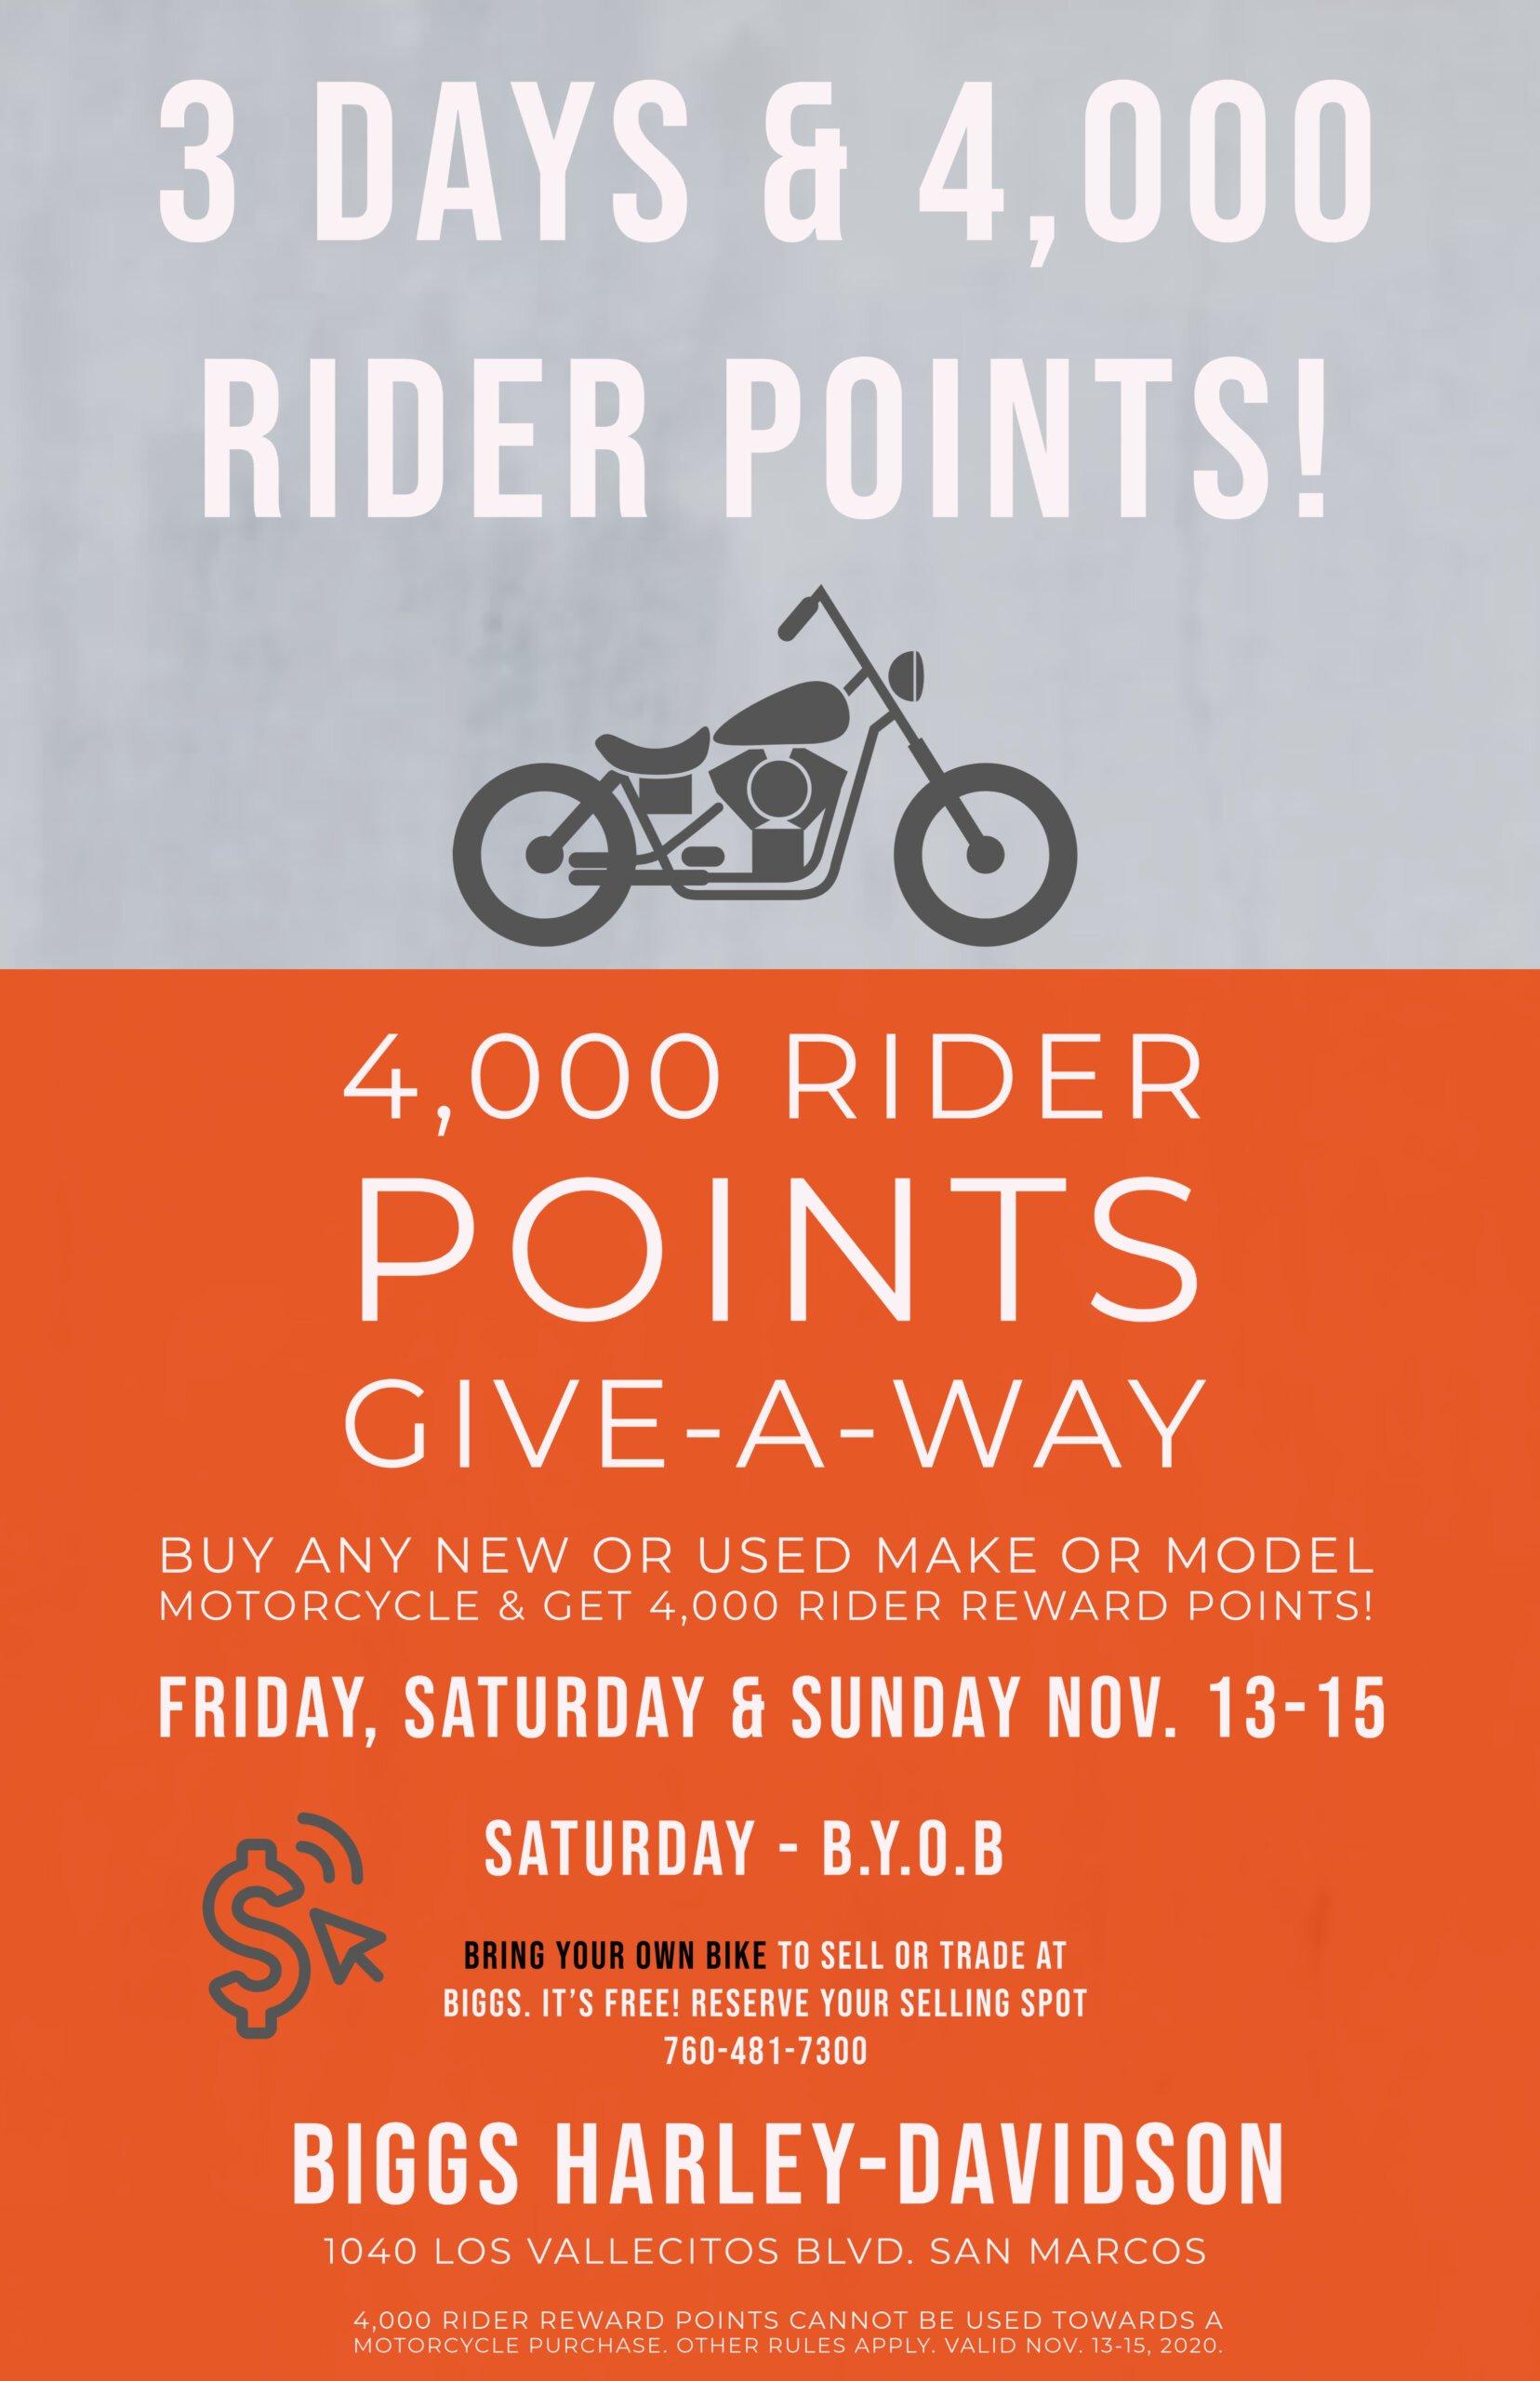 4,000 Rider Points Give-A-Way & BYOB